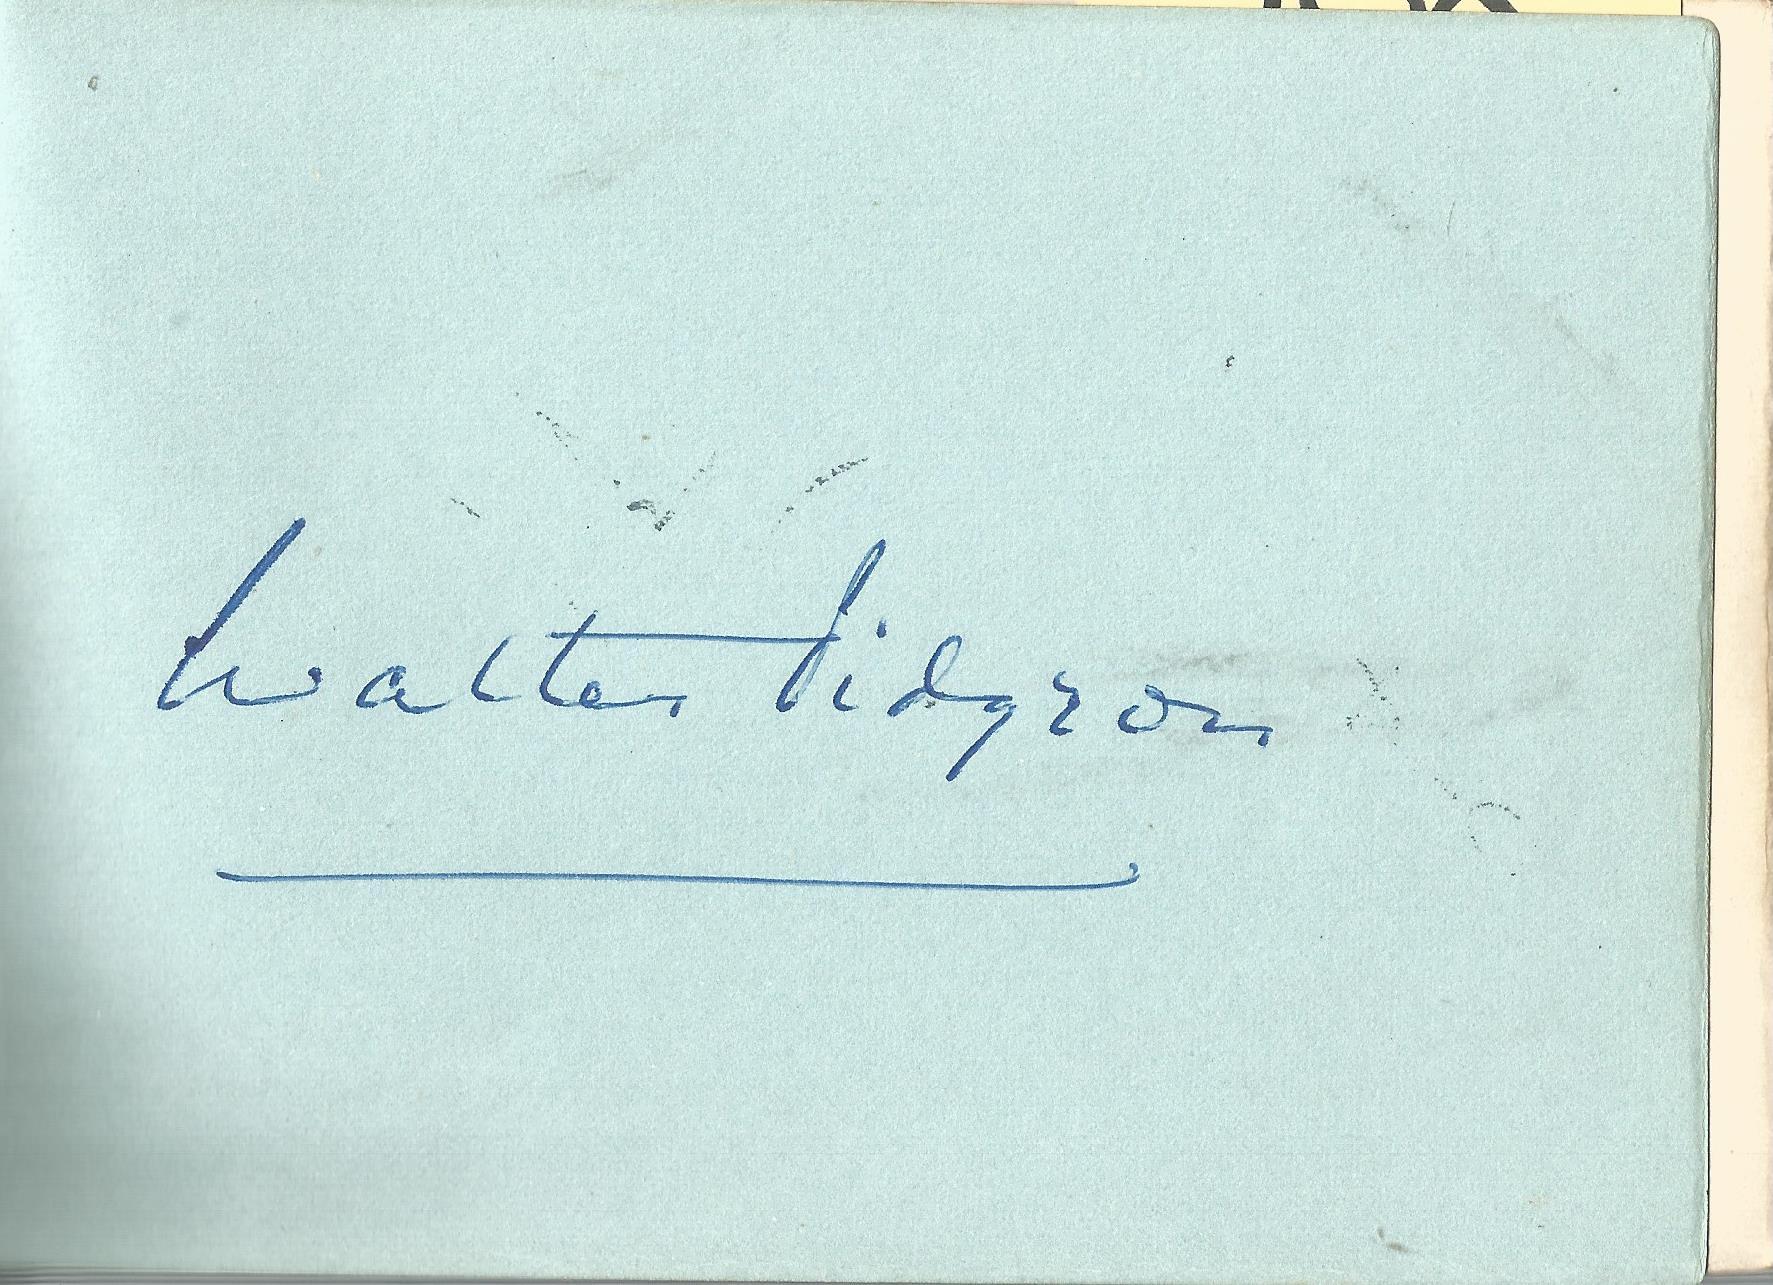 Walter Pigeon signed 6x4 album page. Walter Davis Pidgeon (September 23, 1897 - September 25,